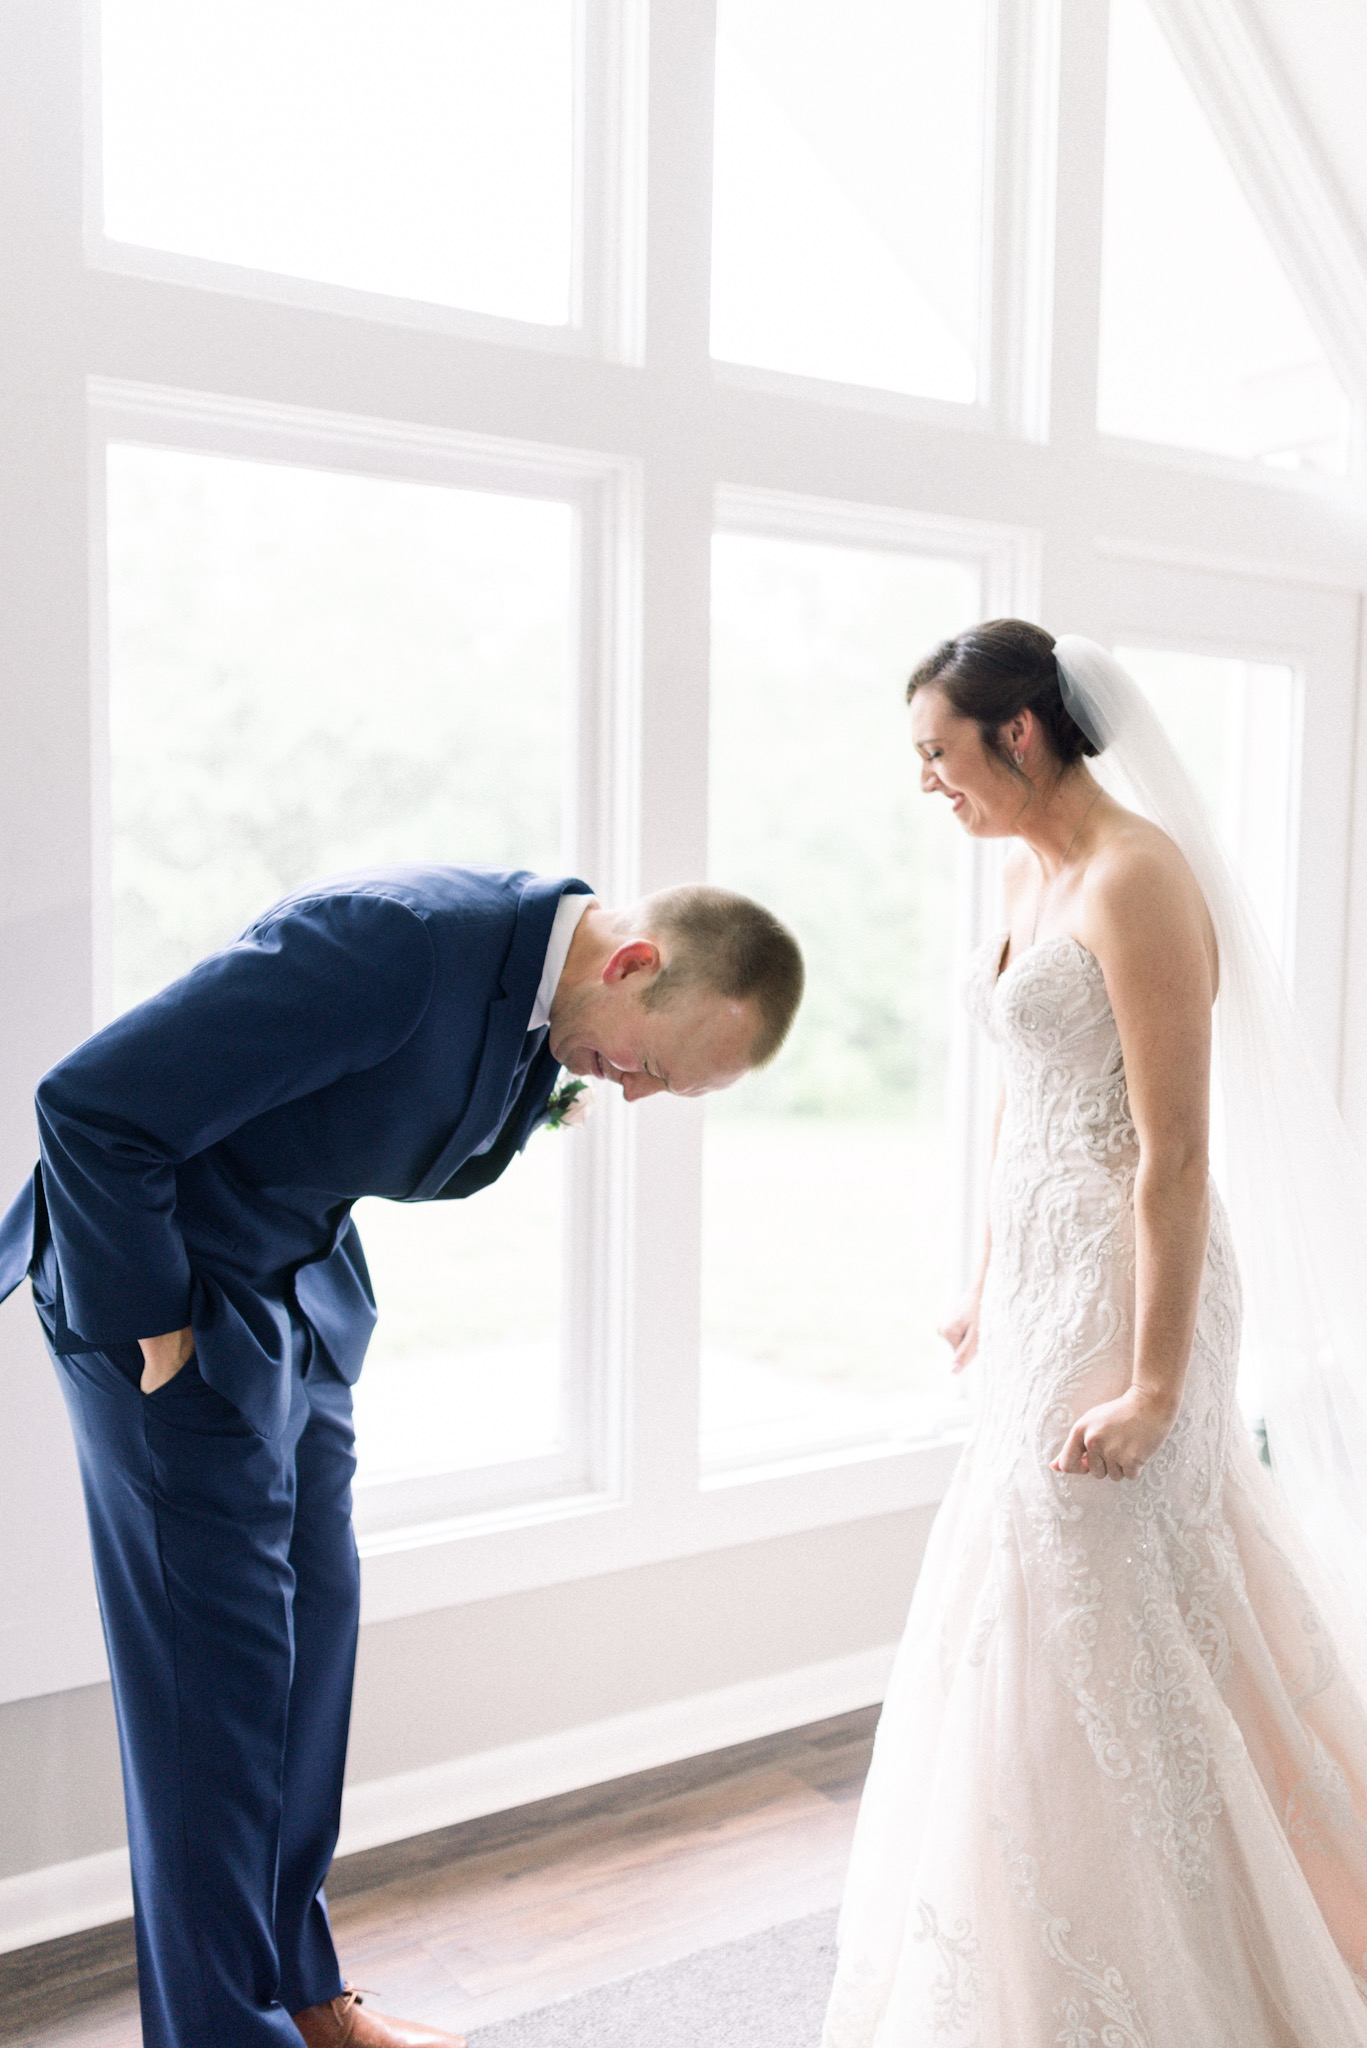 Kait + Jon   An Elegant Rustic Wedding at the Loft on Isanogel in Muncie, IN   Indianapolis Wedding Photographers